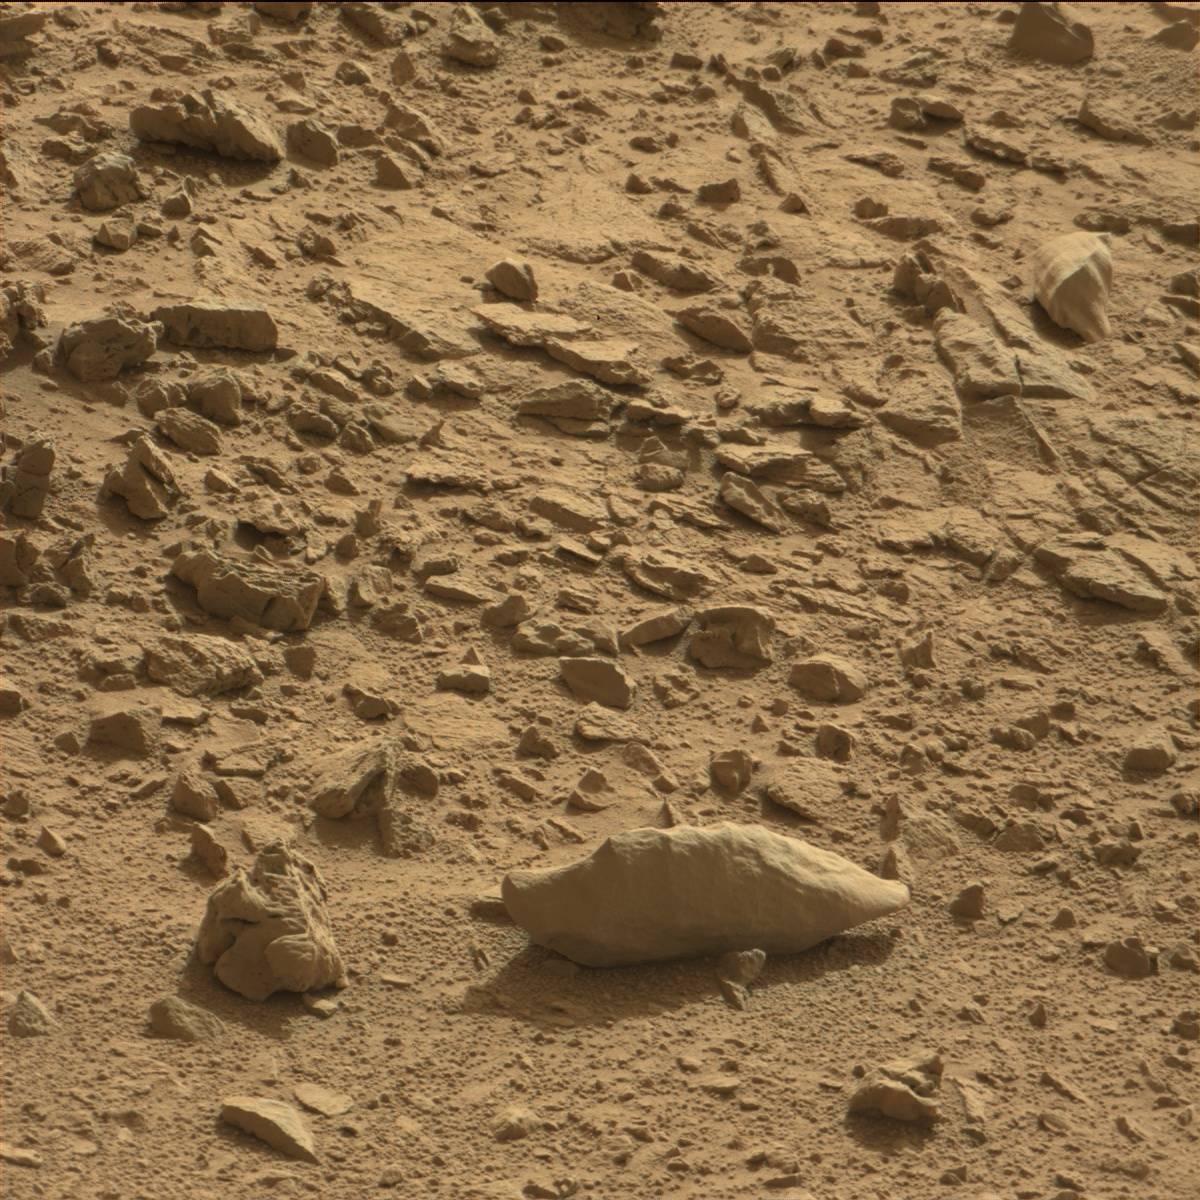 nasa life on mars rumor - photo #15